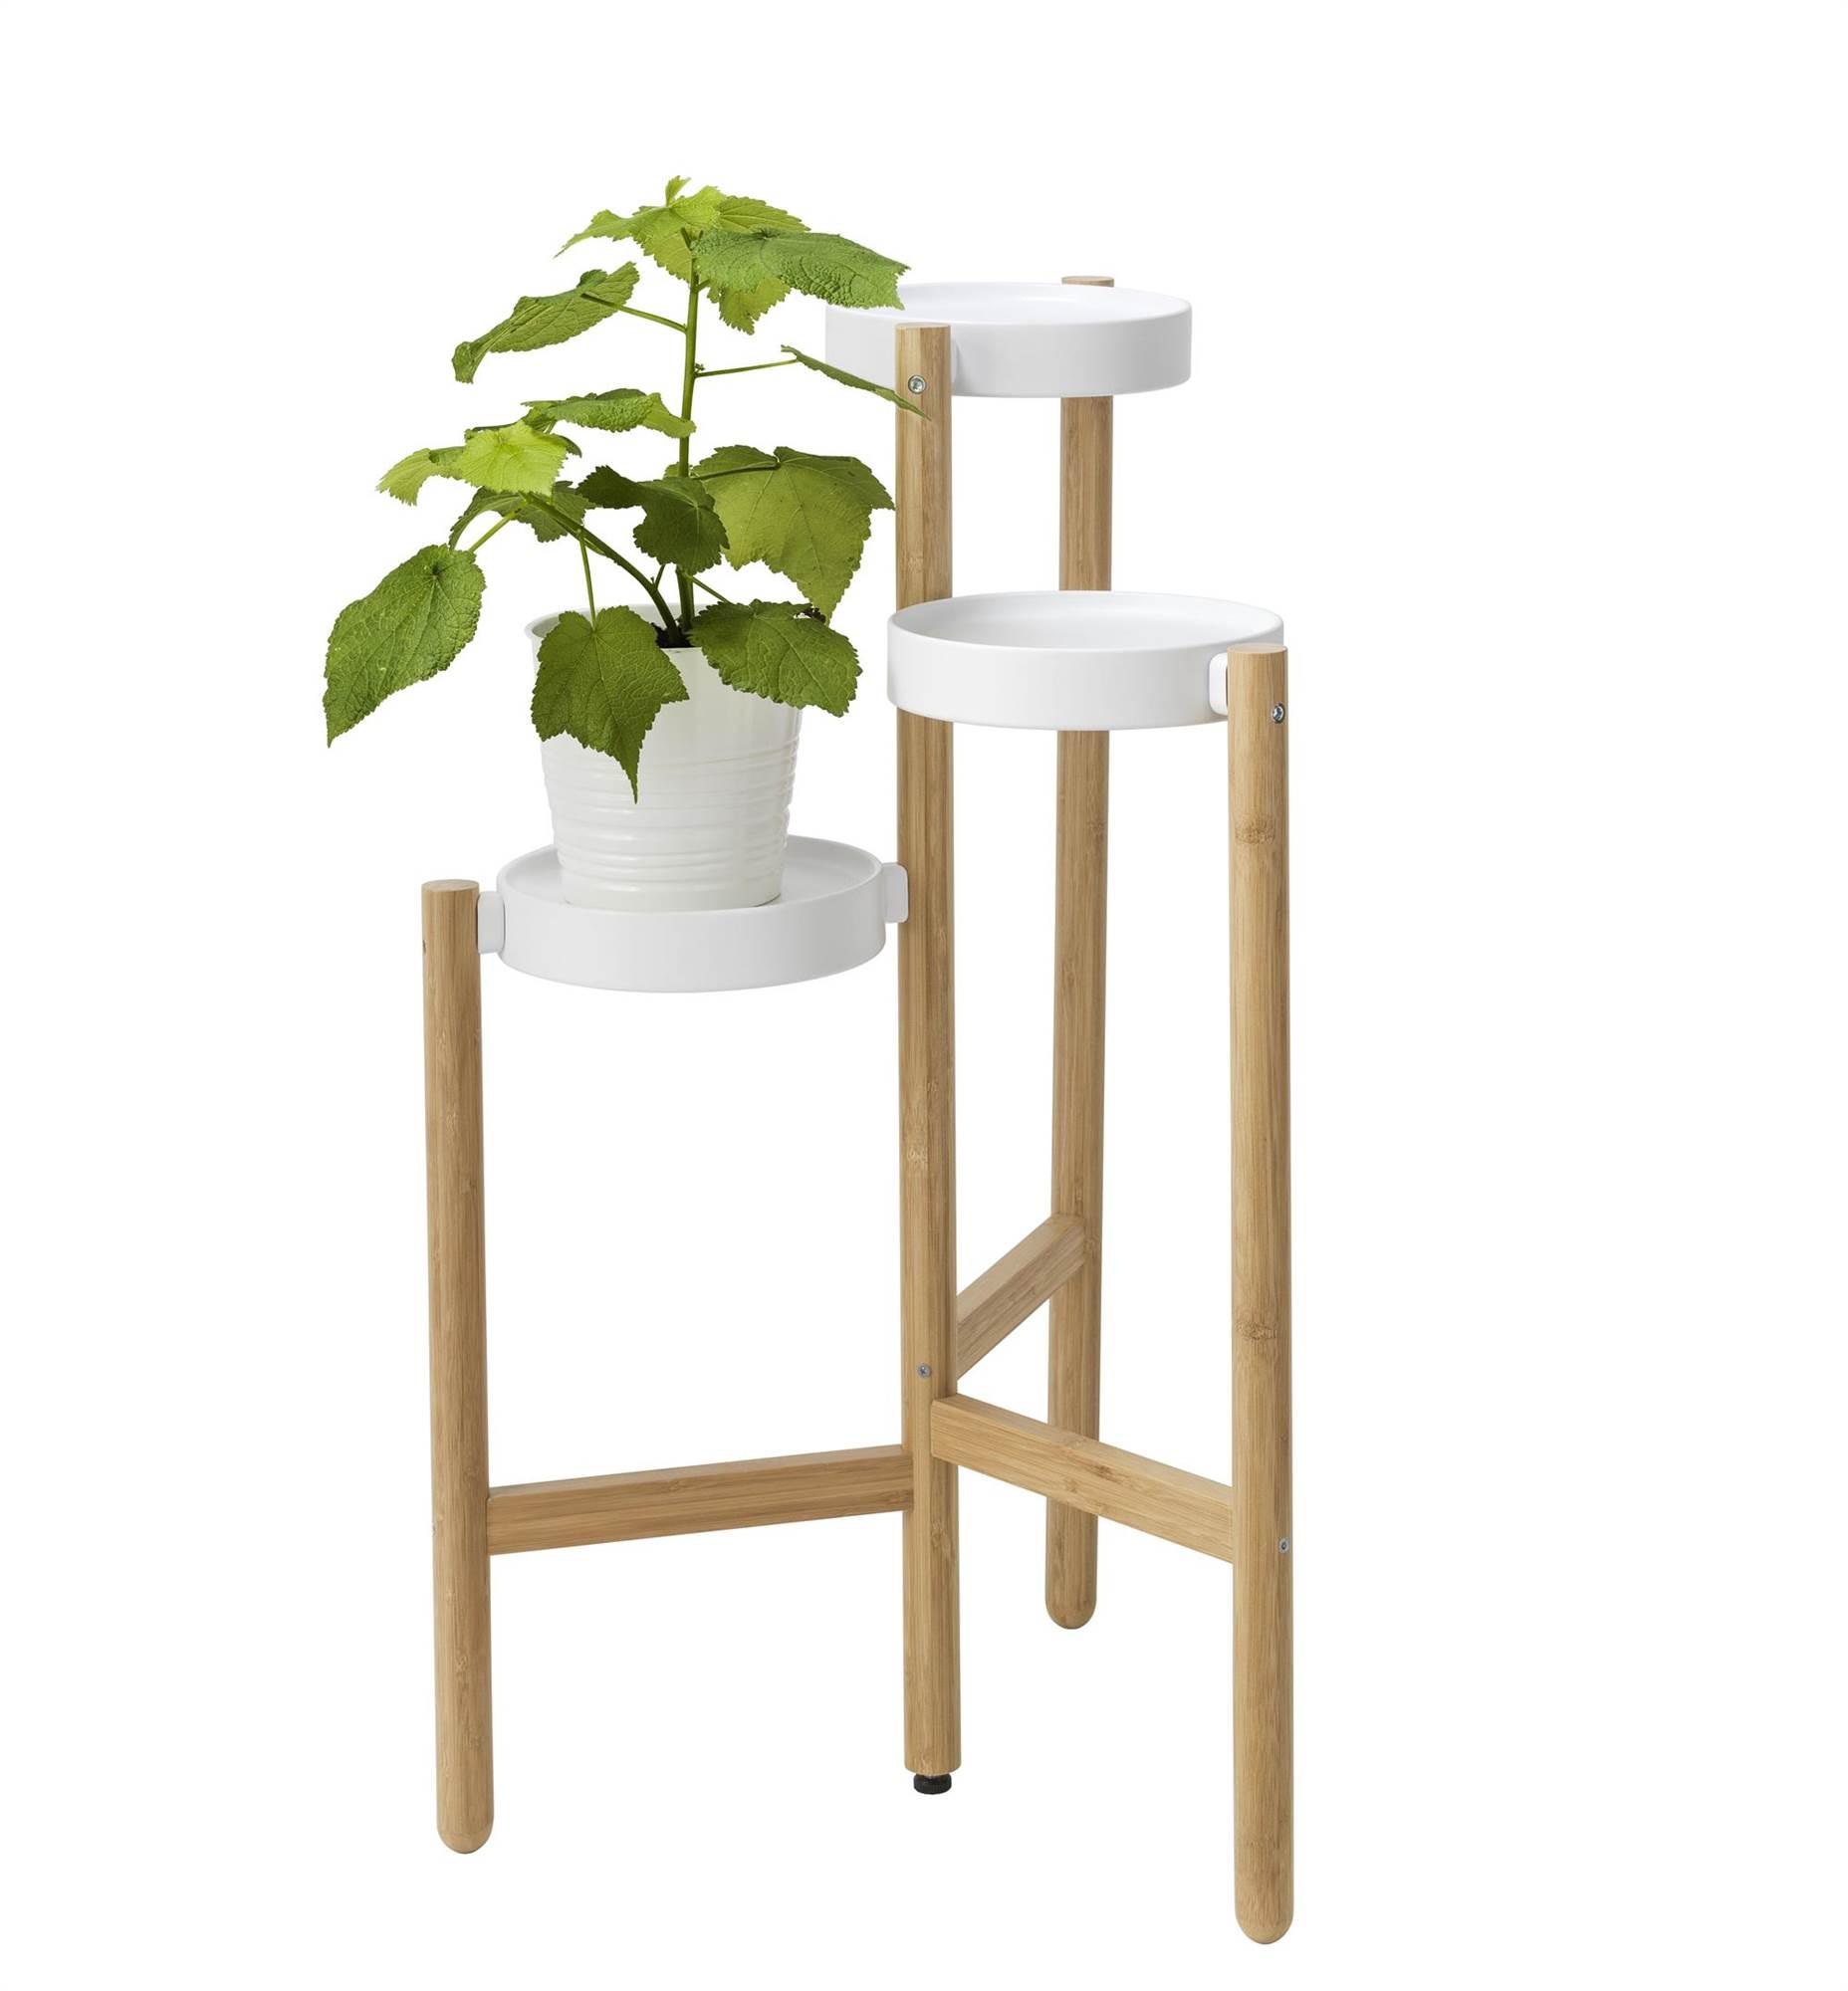 Muebles soporte para macetas obtenga ideas dise o de for Muebles para plantas